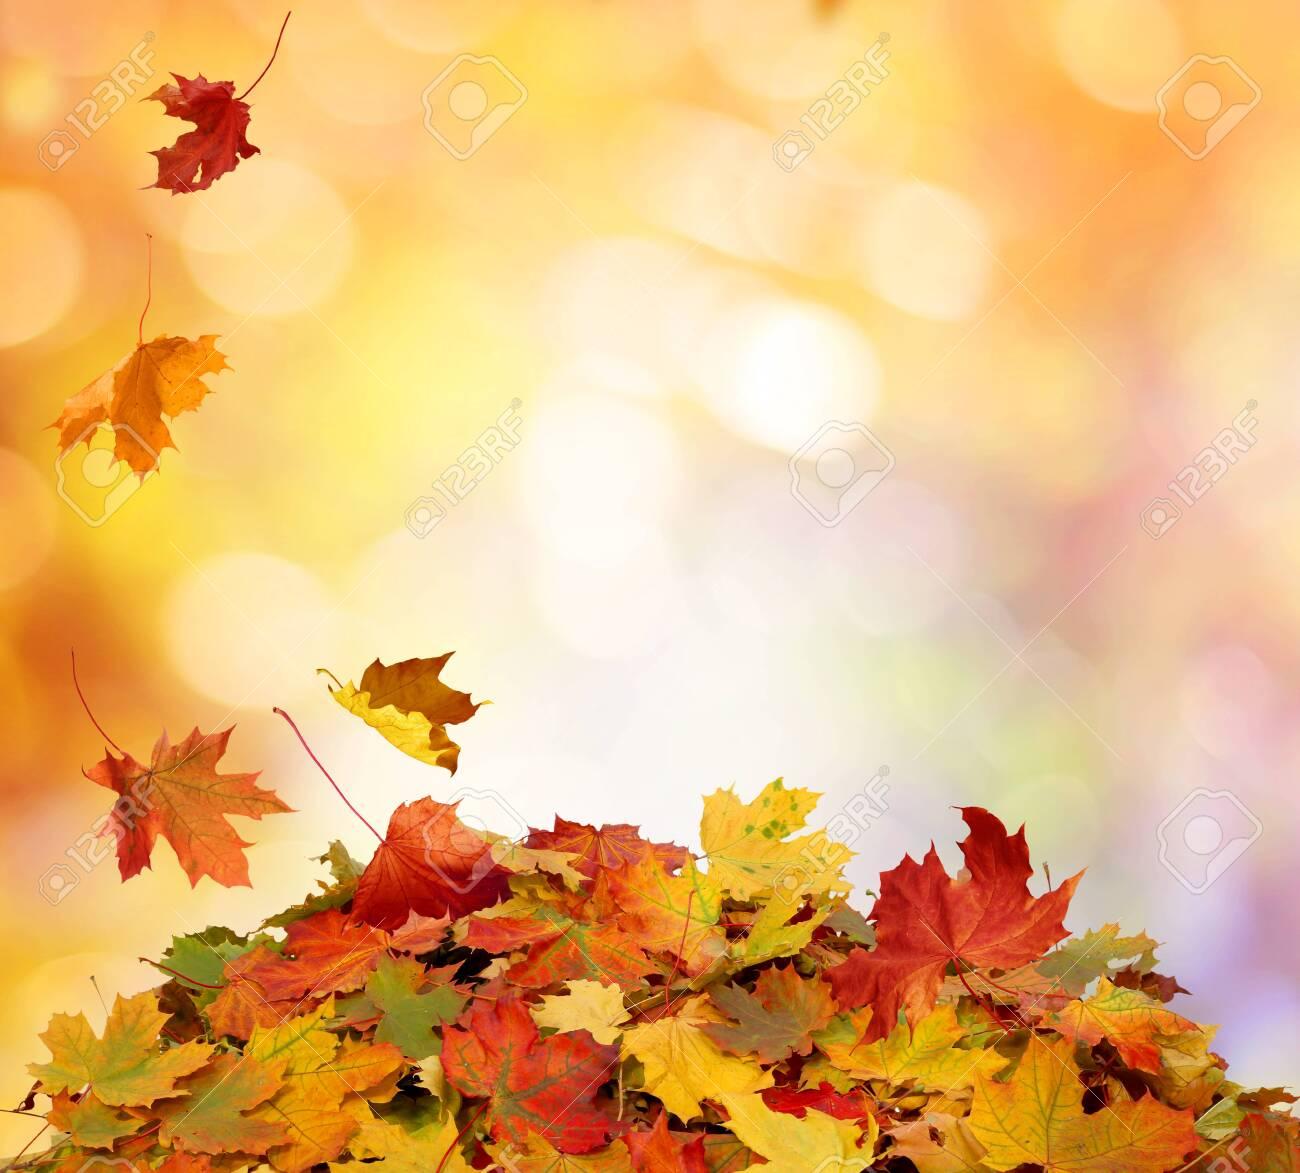 Autumn falling maple leaves - 134272719